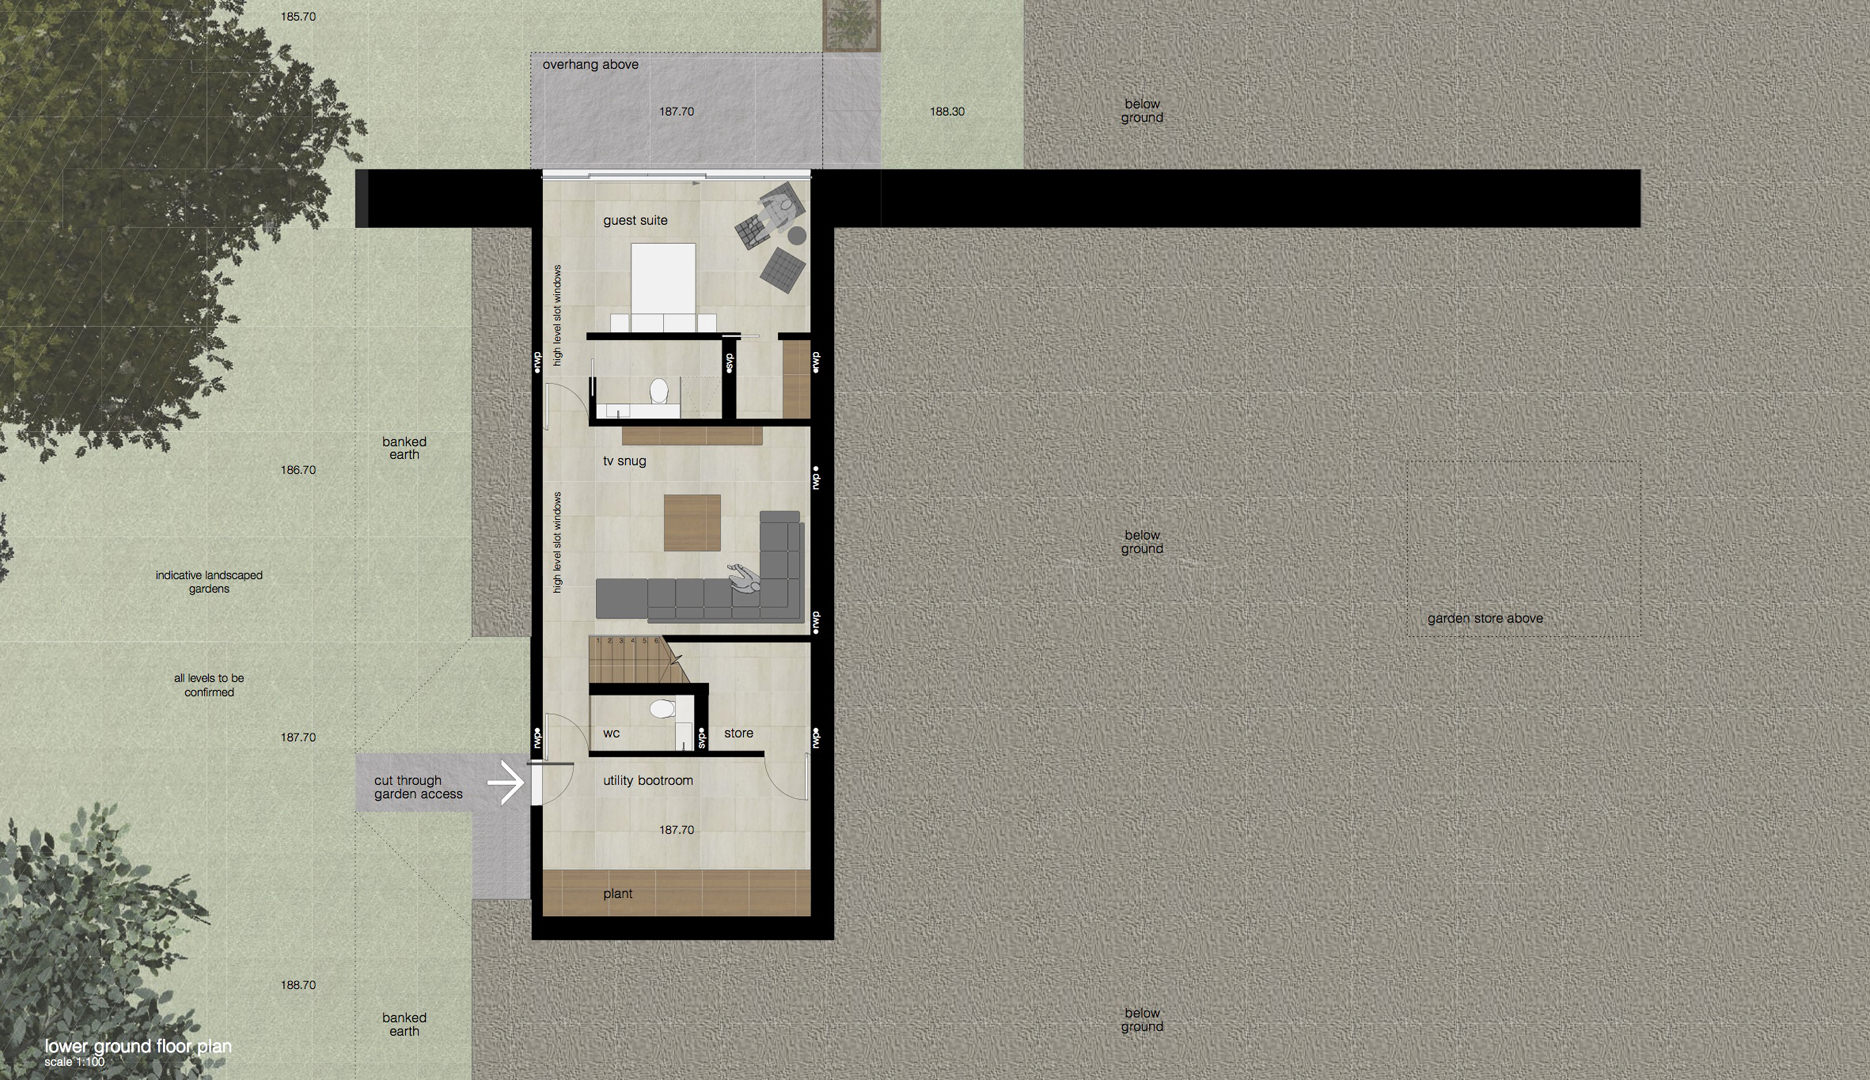 proposed lower ground floor plan